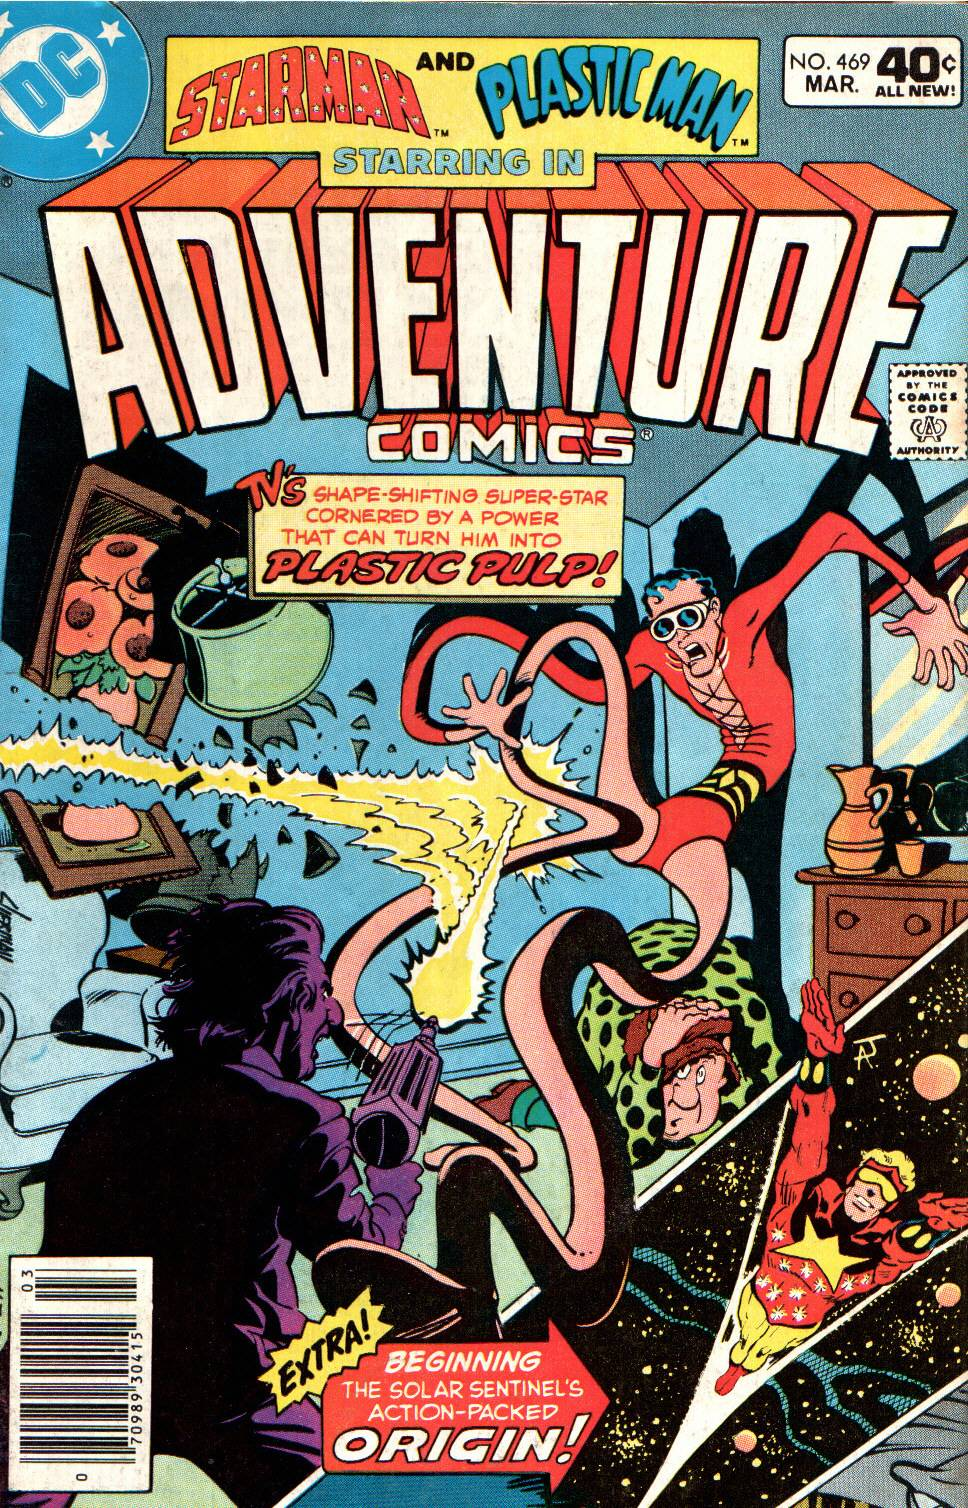 Read online Adventure Comics (1938) comic -  Issue #469 - 1